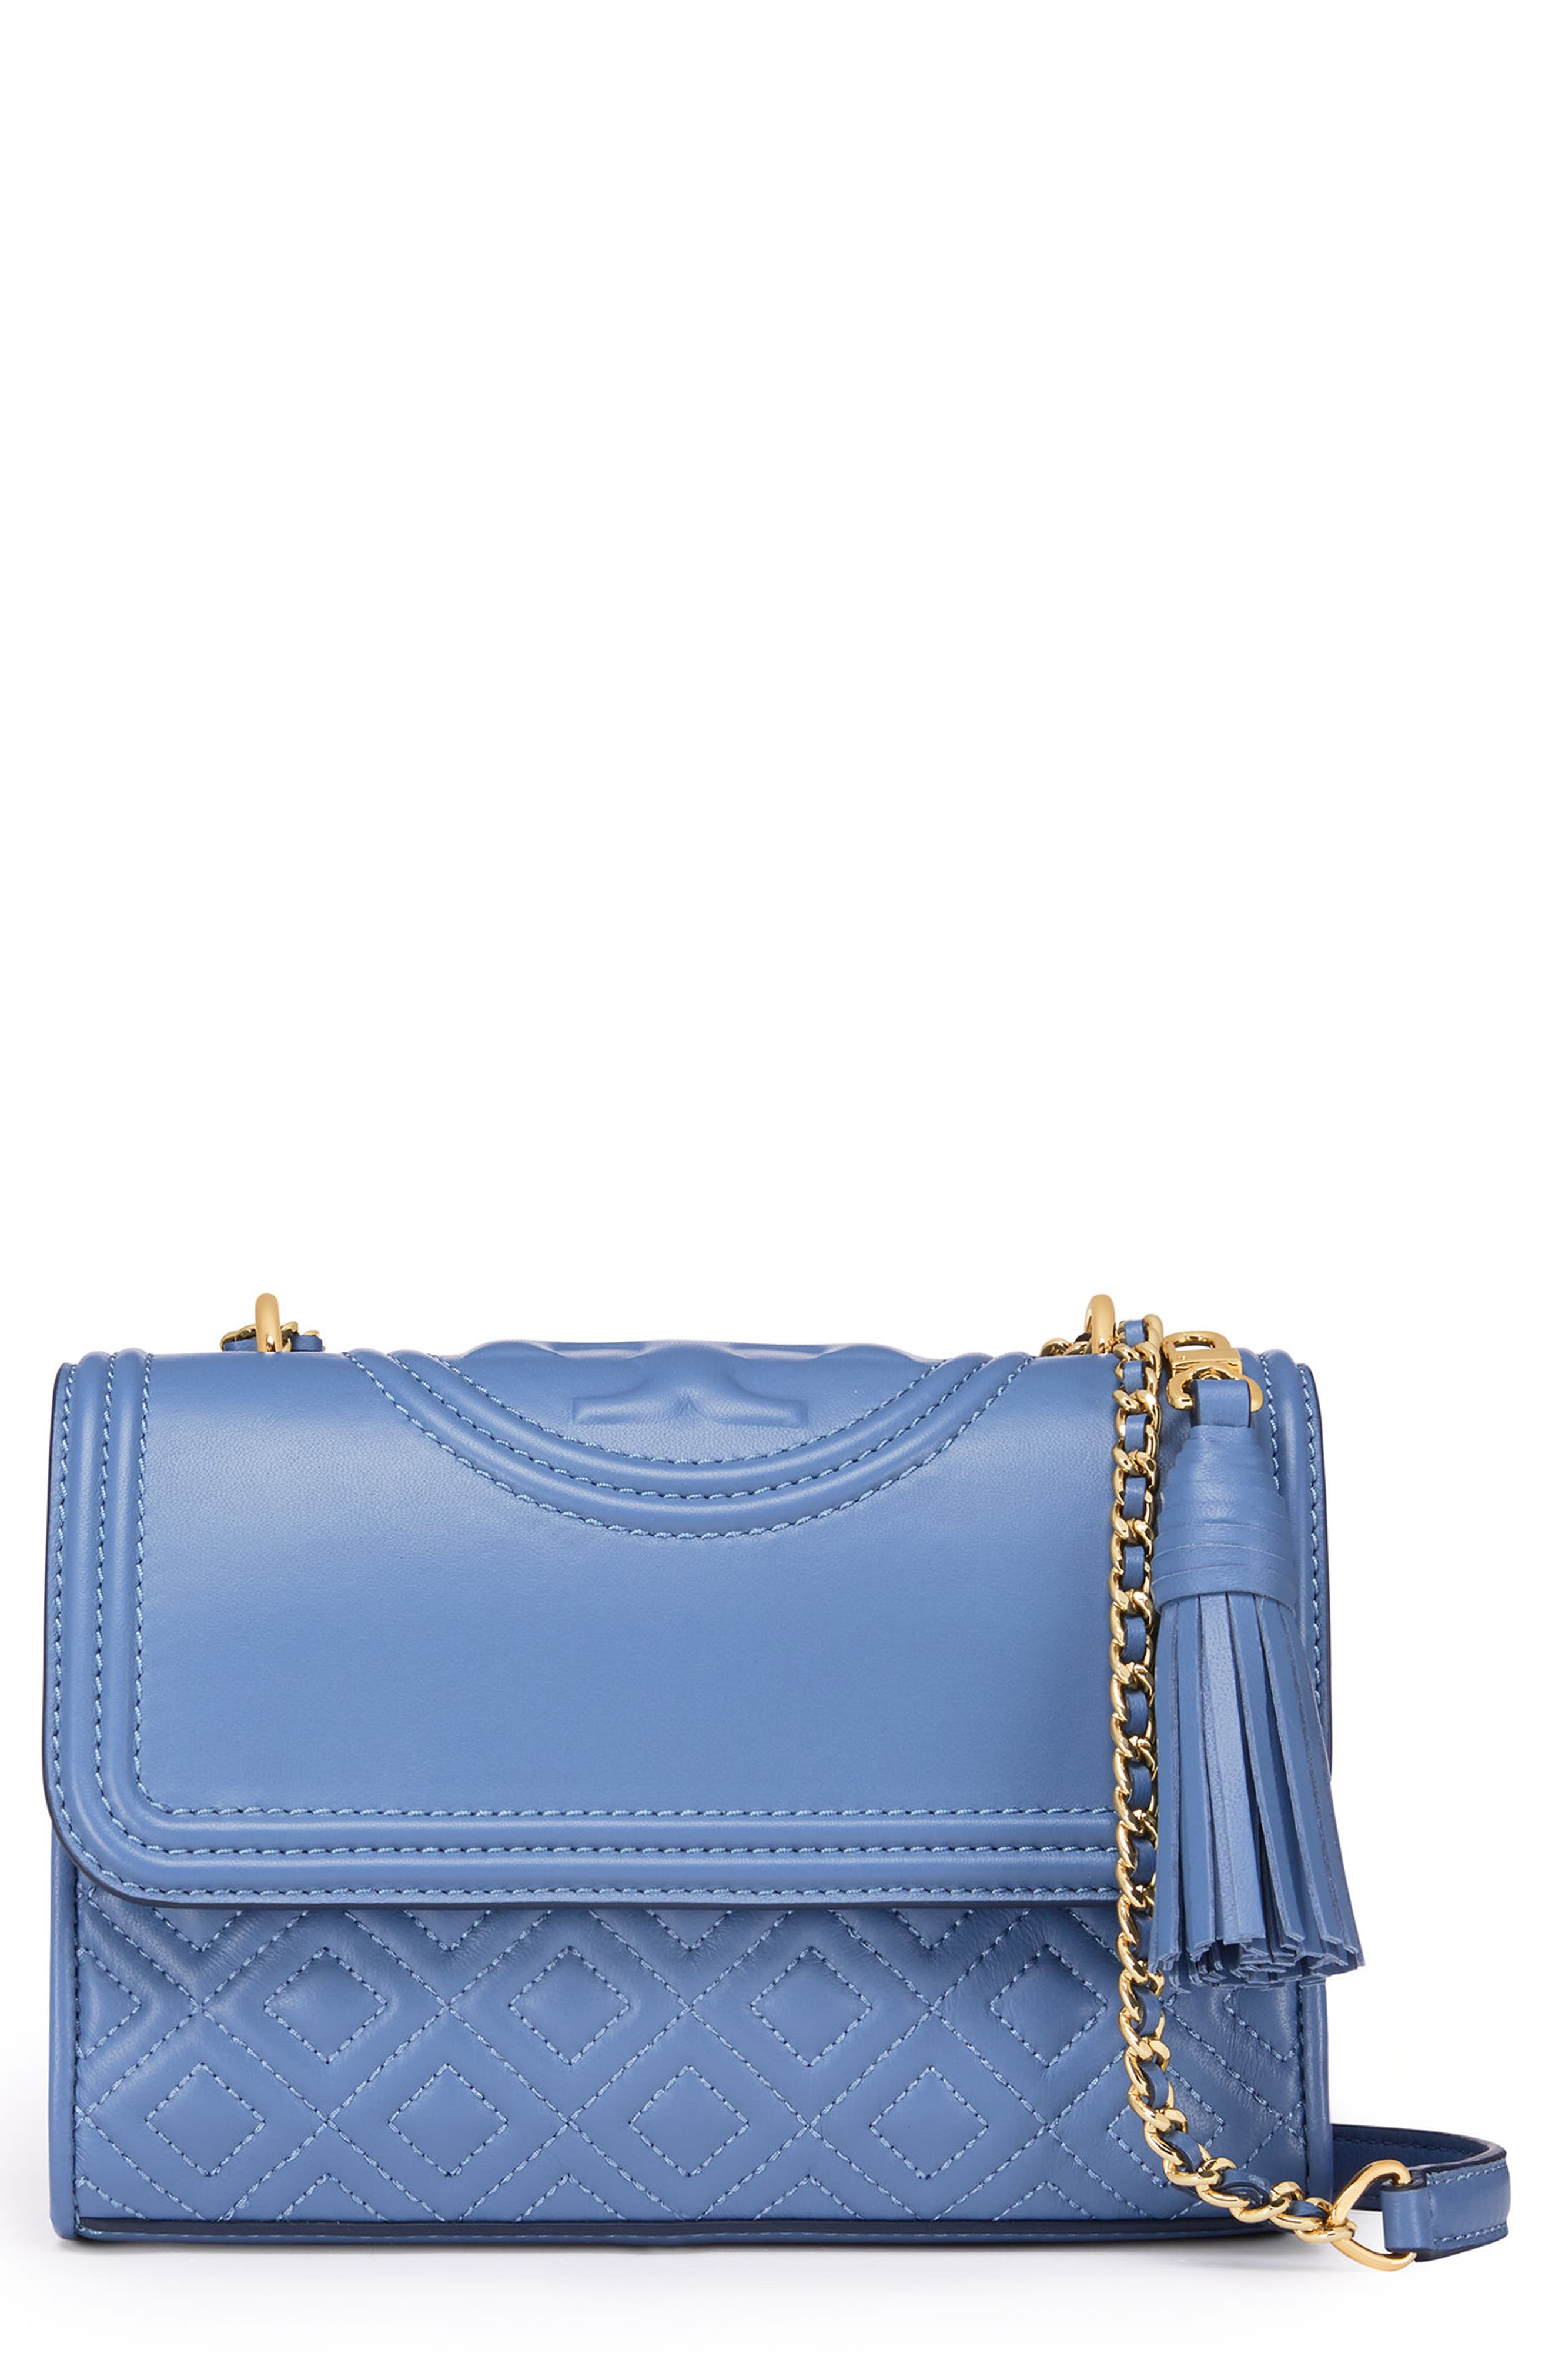 Fleming Convertible Leather Shoulder Bag,                             Main thumbnail 1, color,                             401